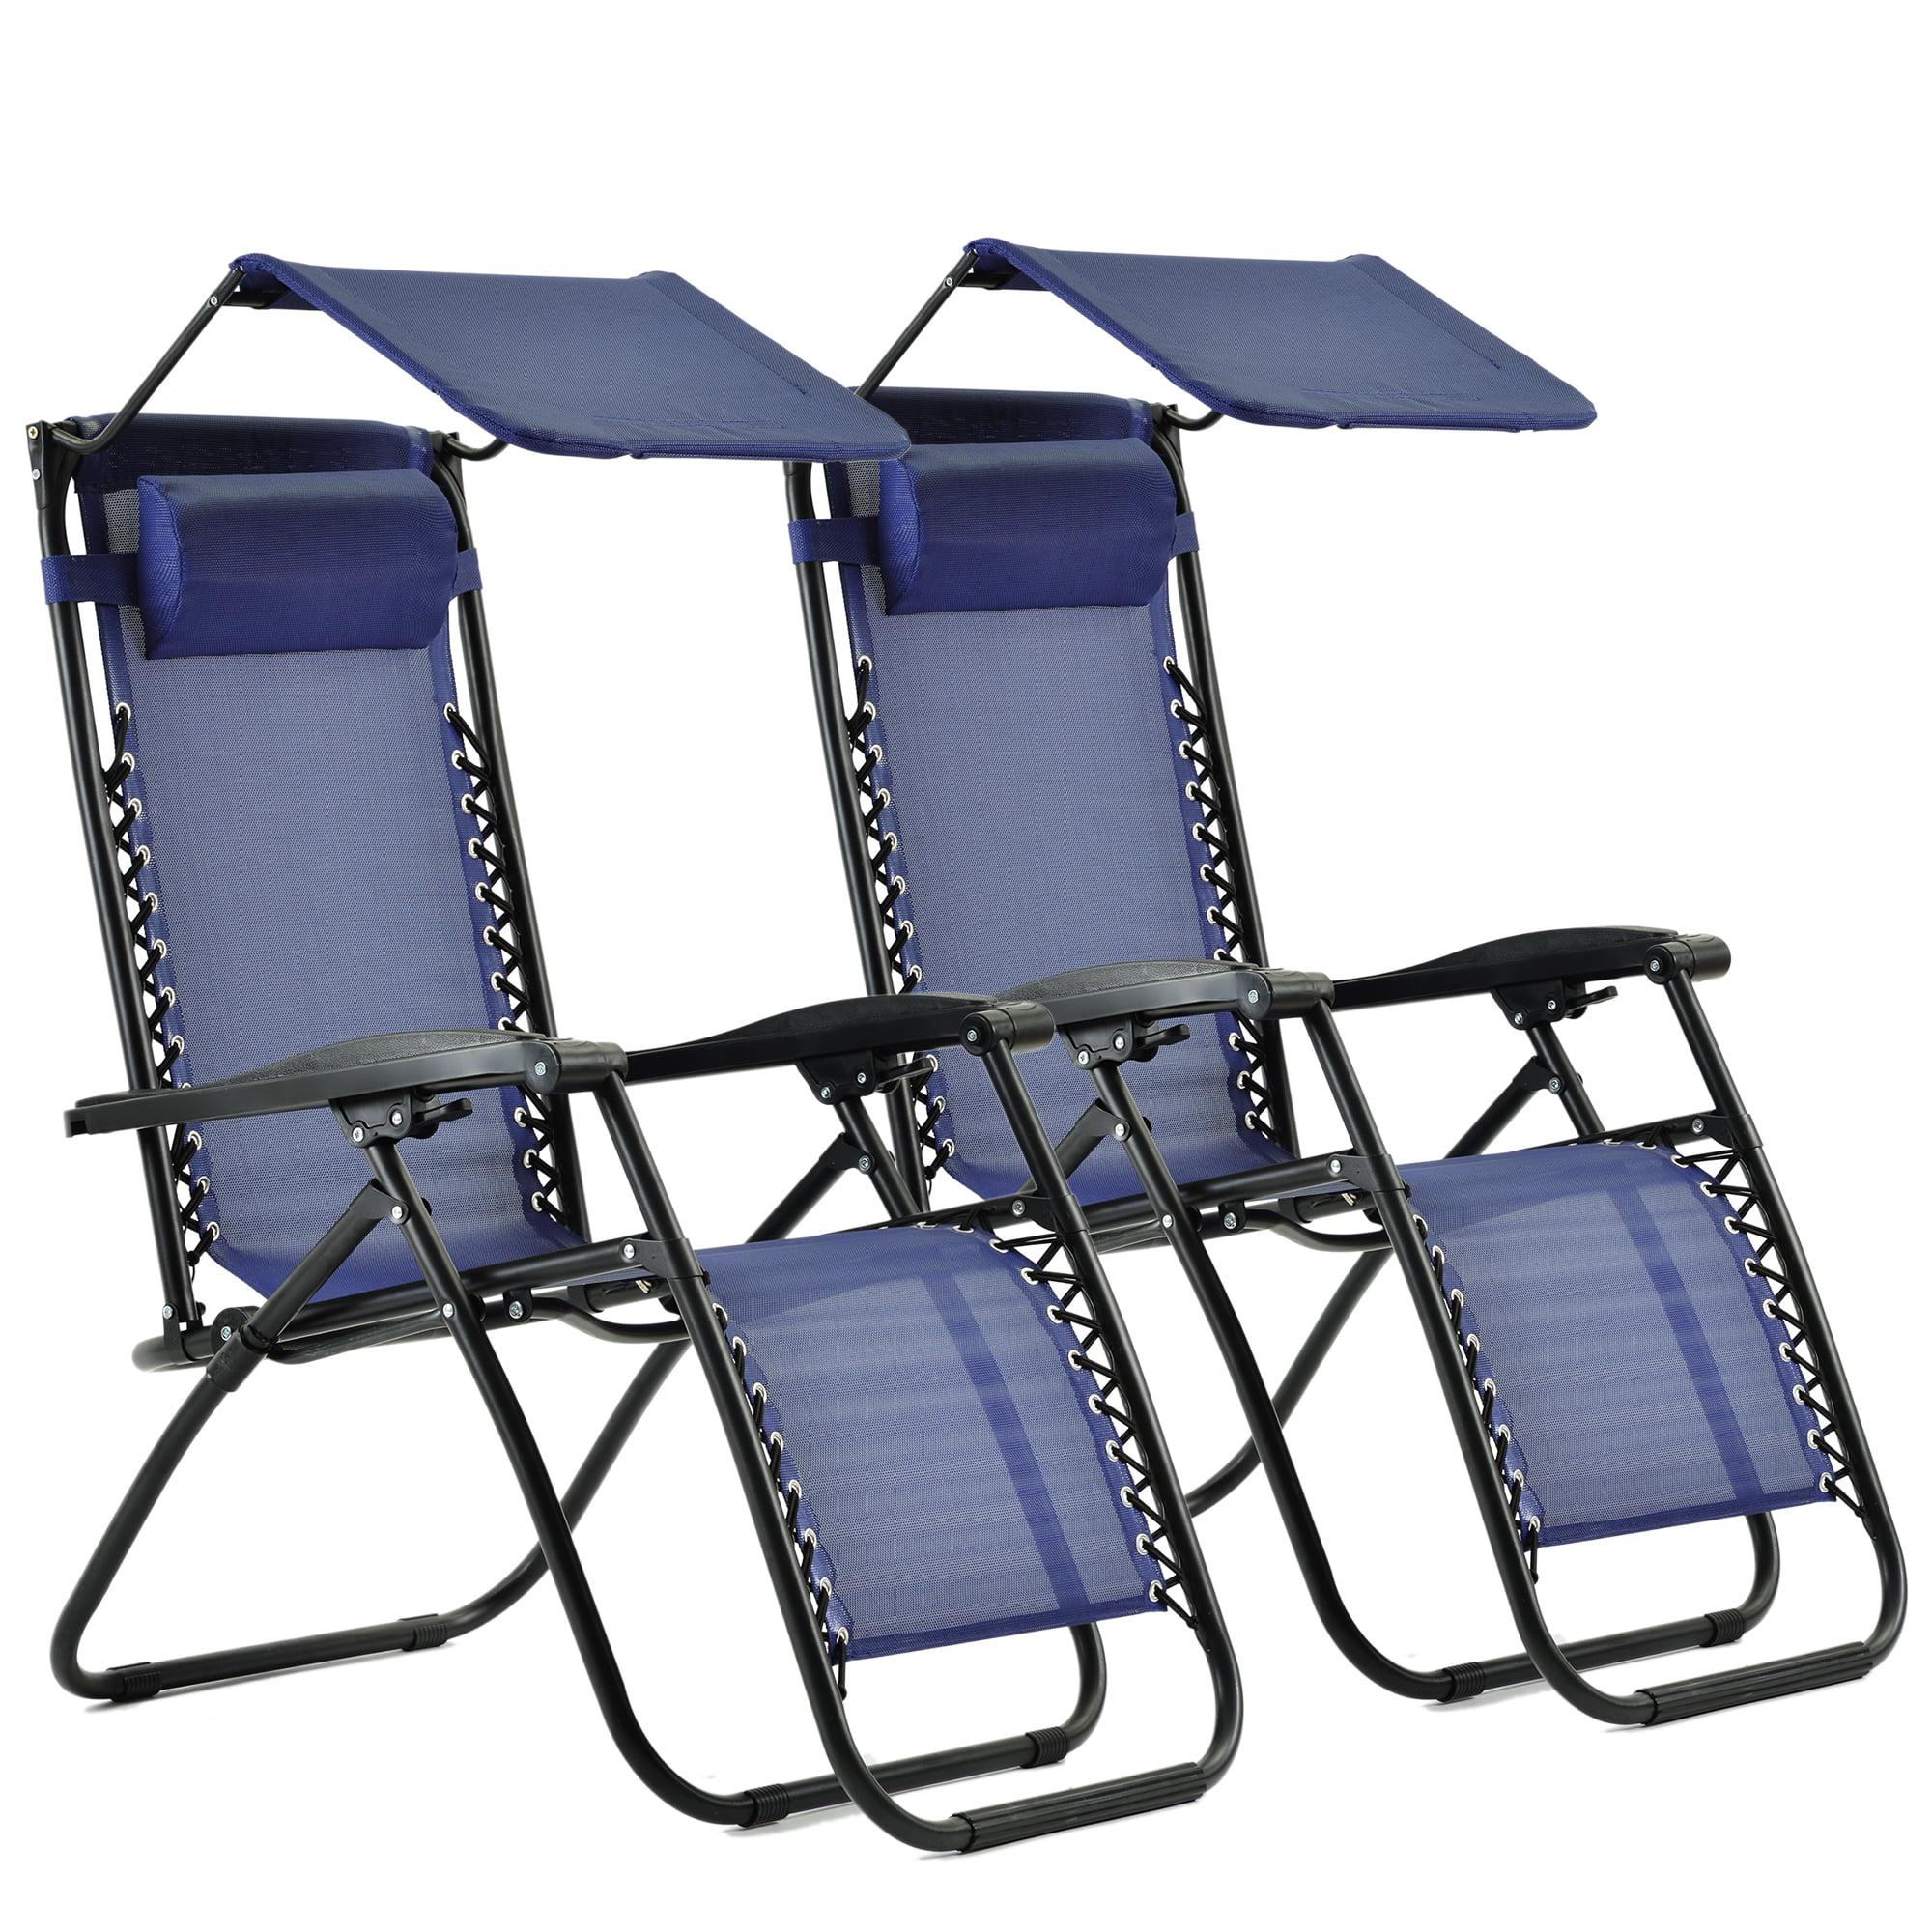 2 Pcs Zero Gravity Chair Lightweight Patio Chaise Lounge